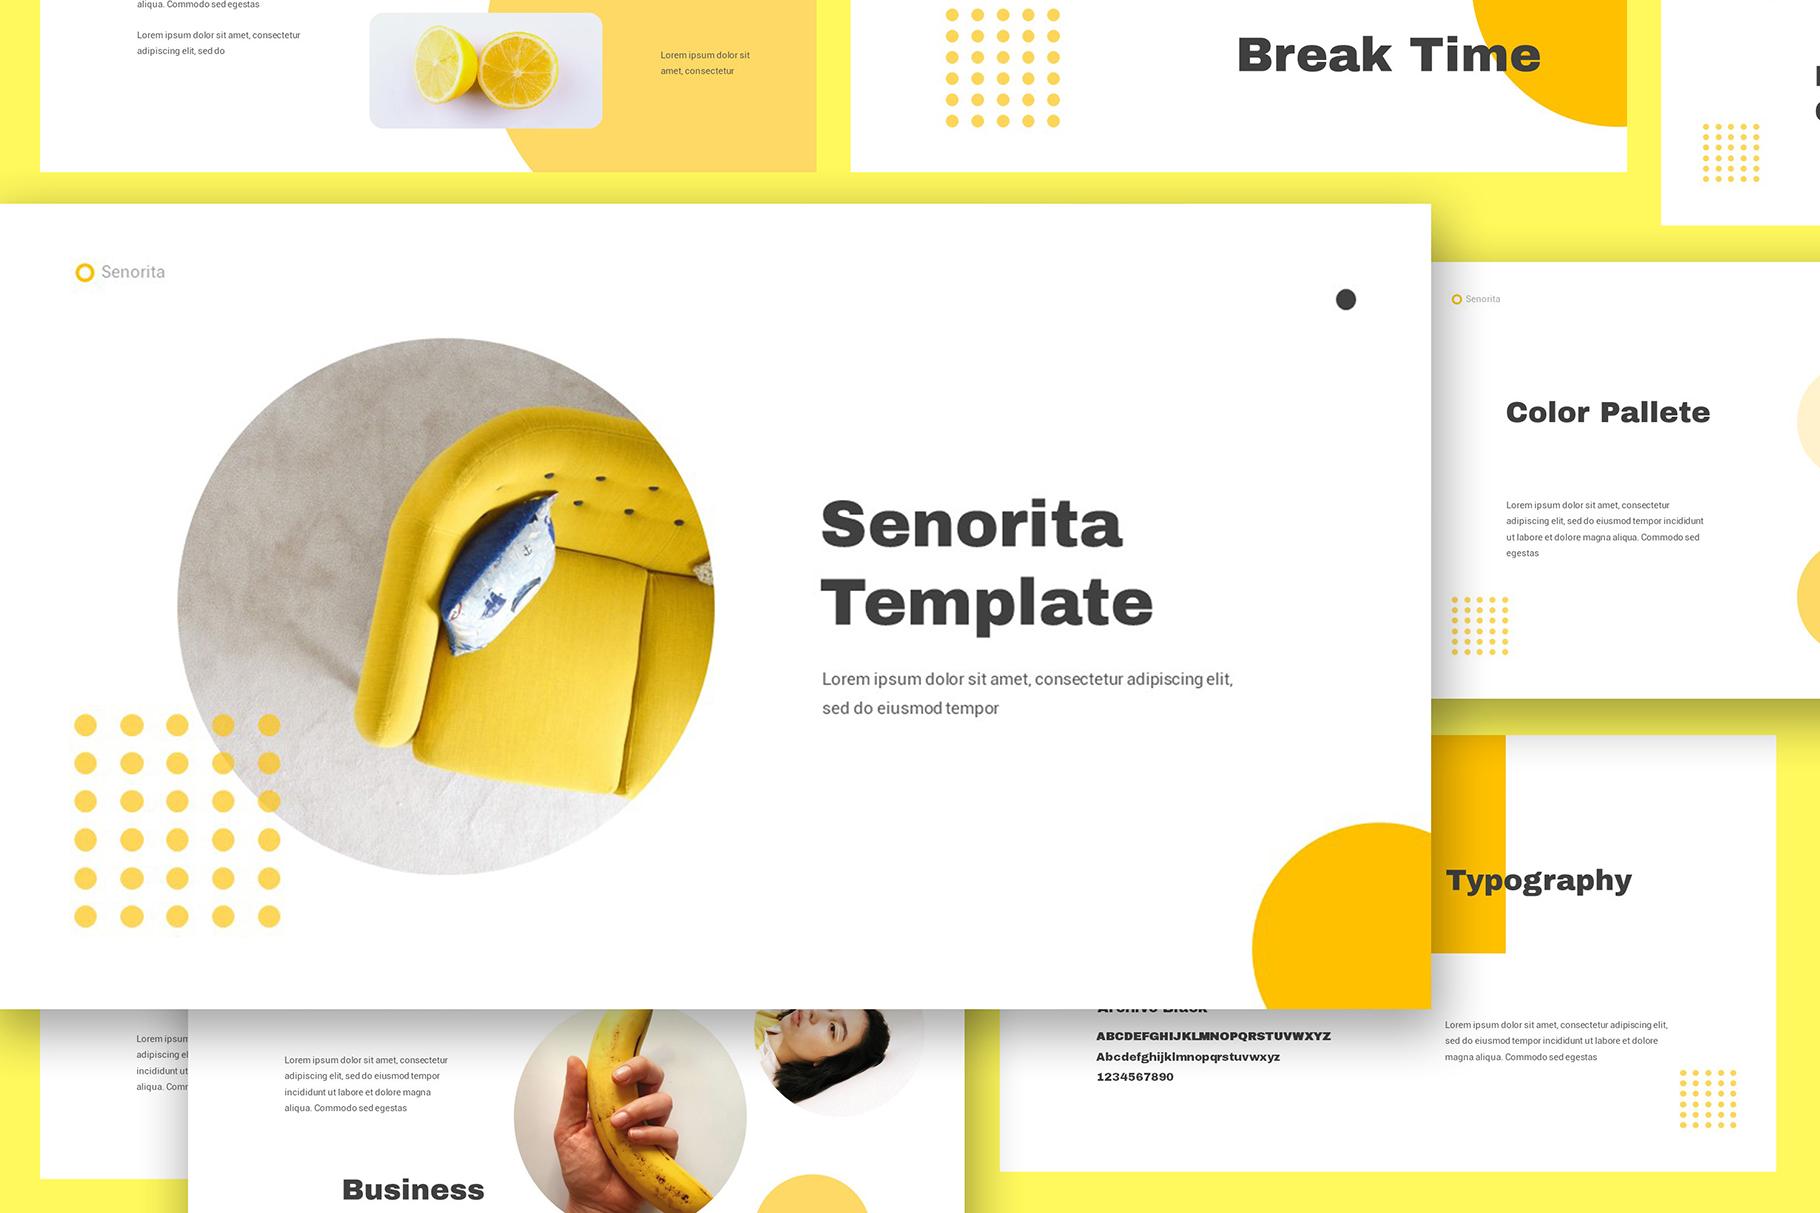 Senorita Brand Guideline Keynote example image 4